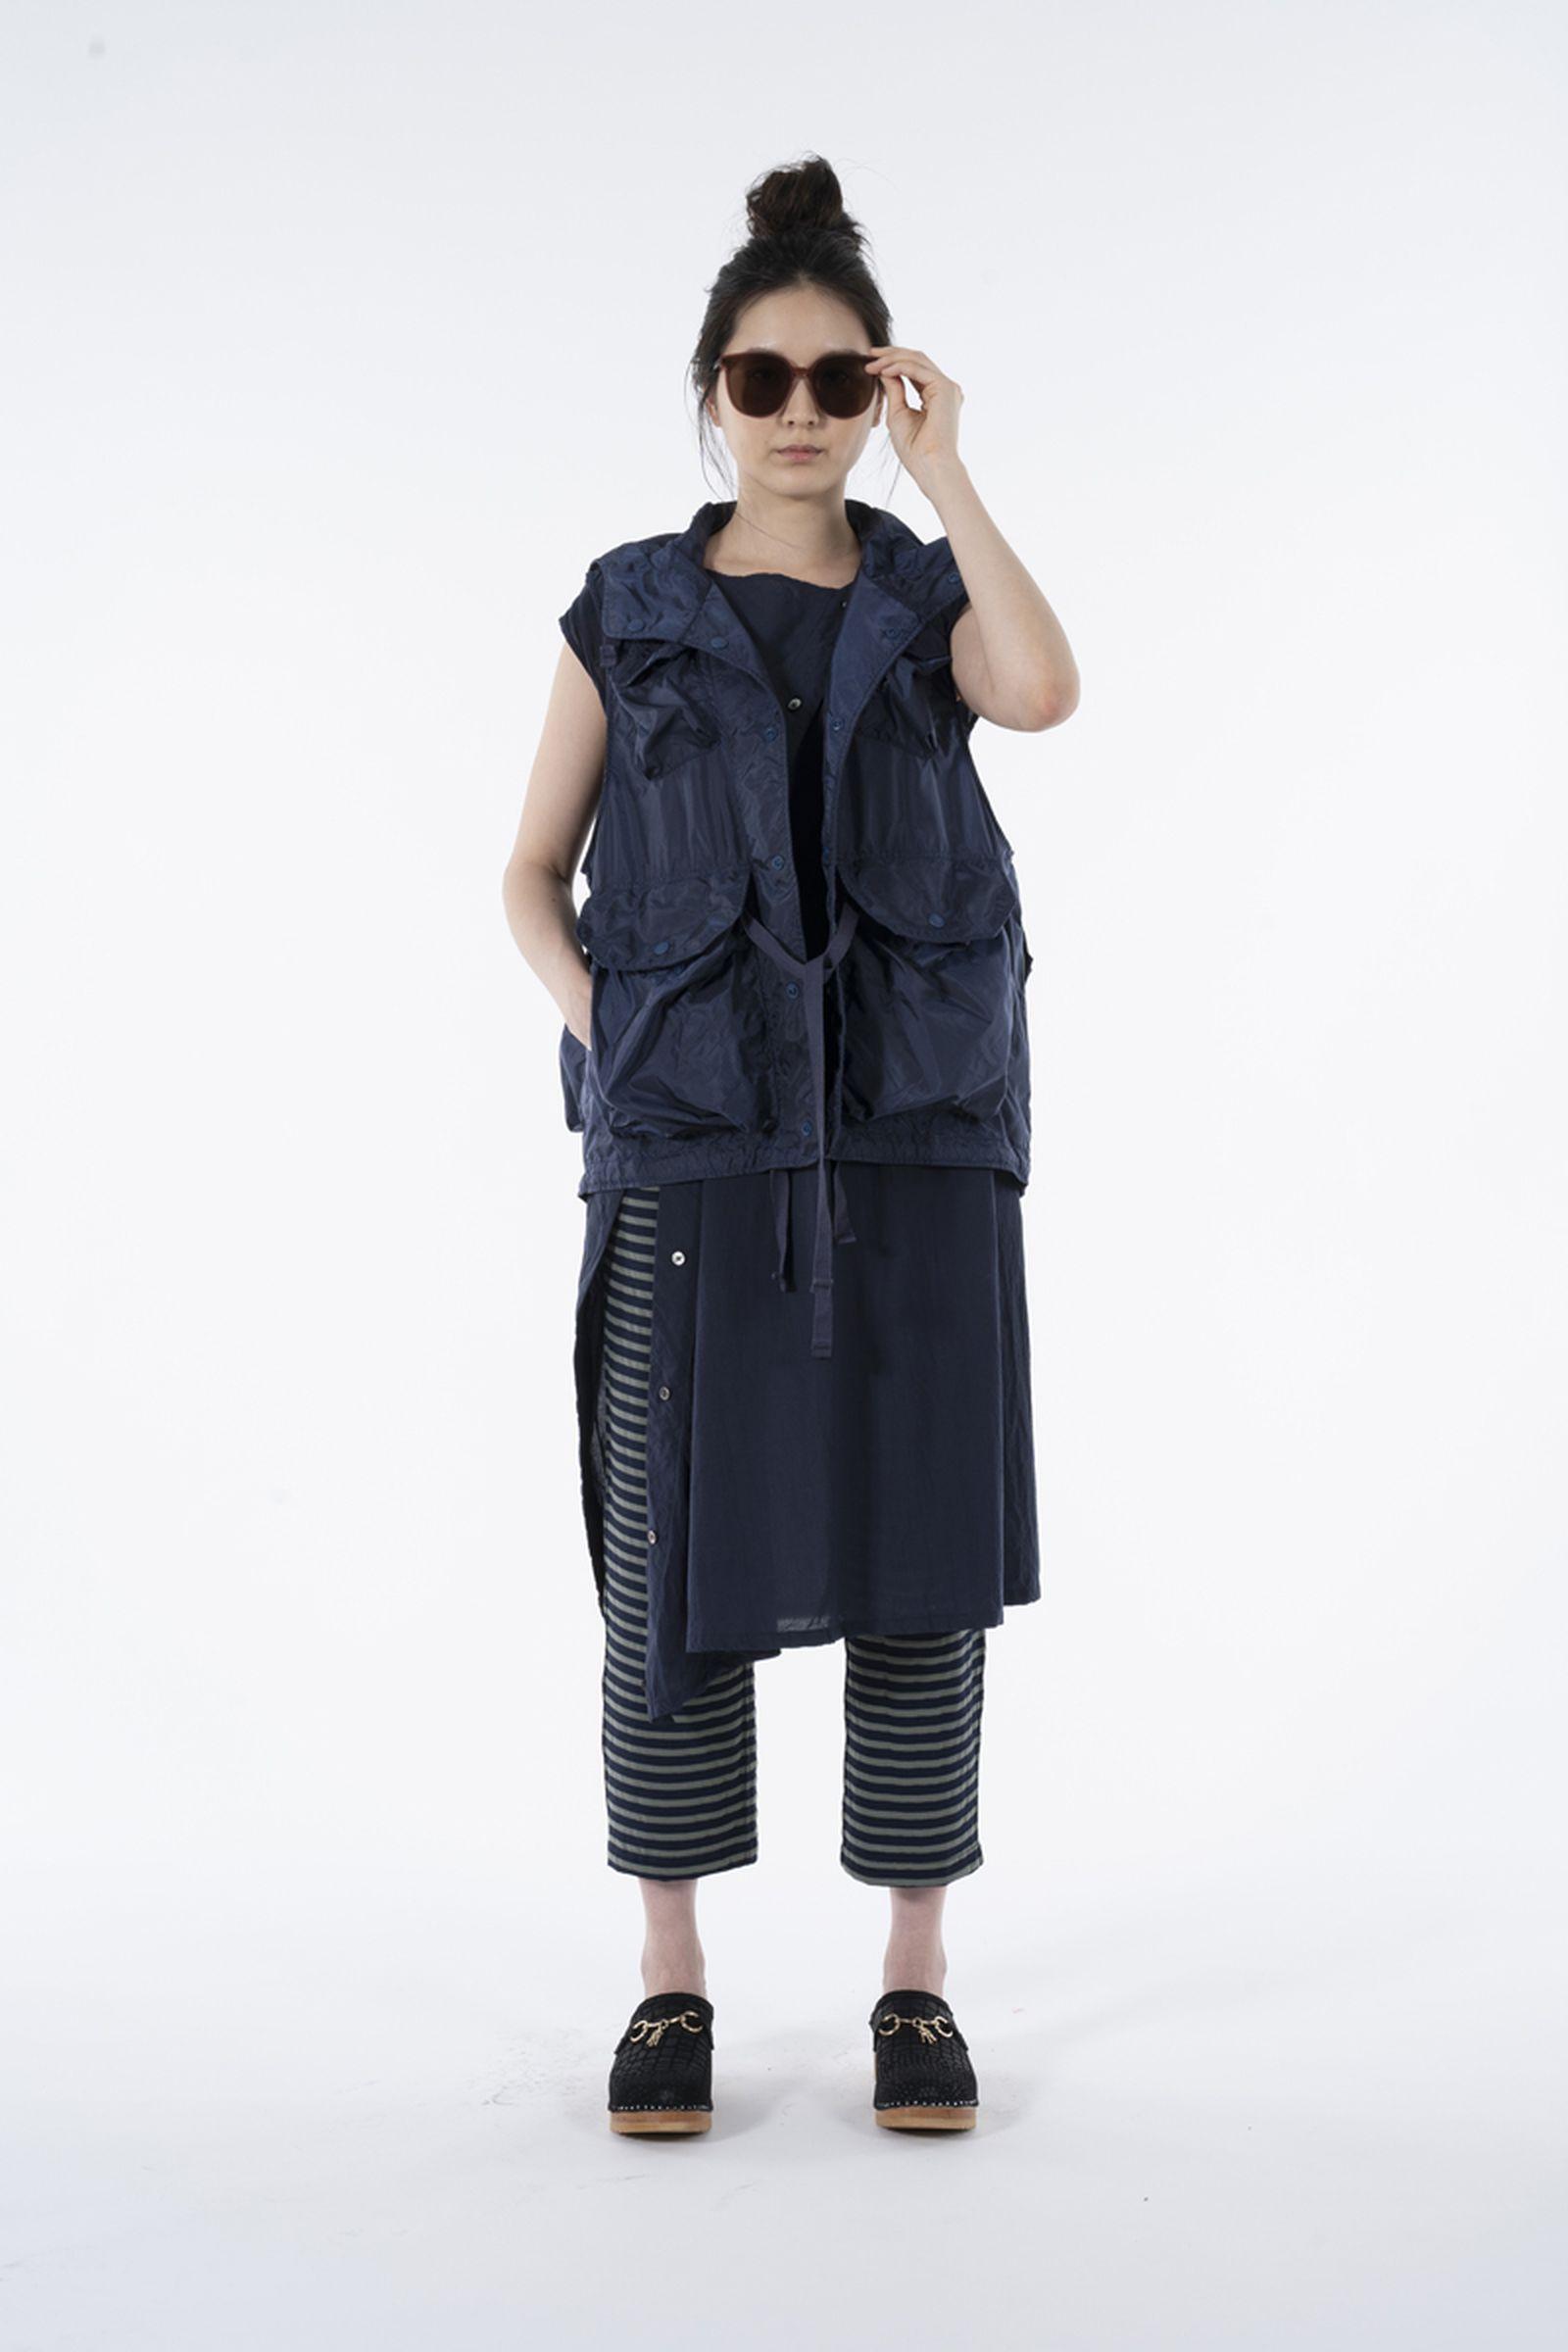 engineered-garments-ss21-18